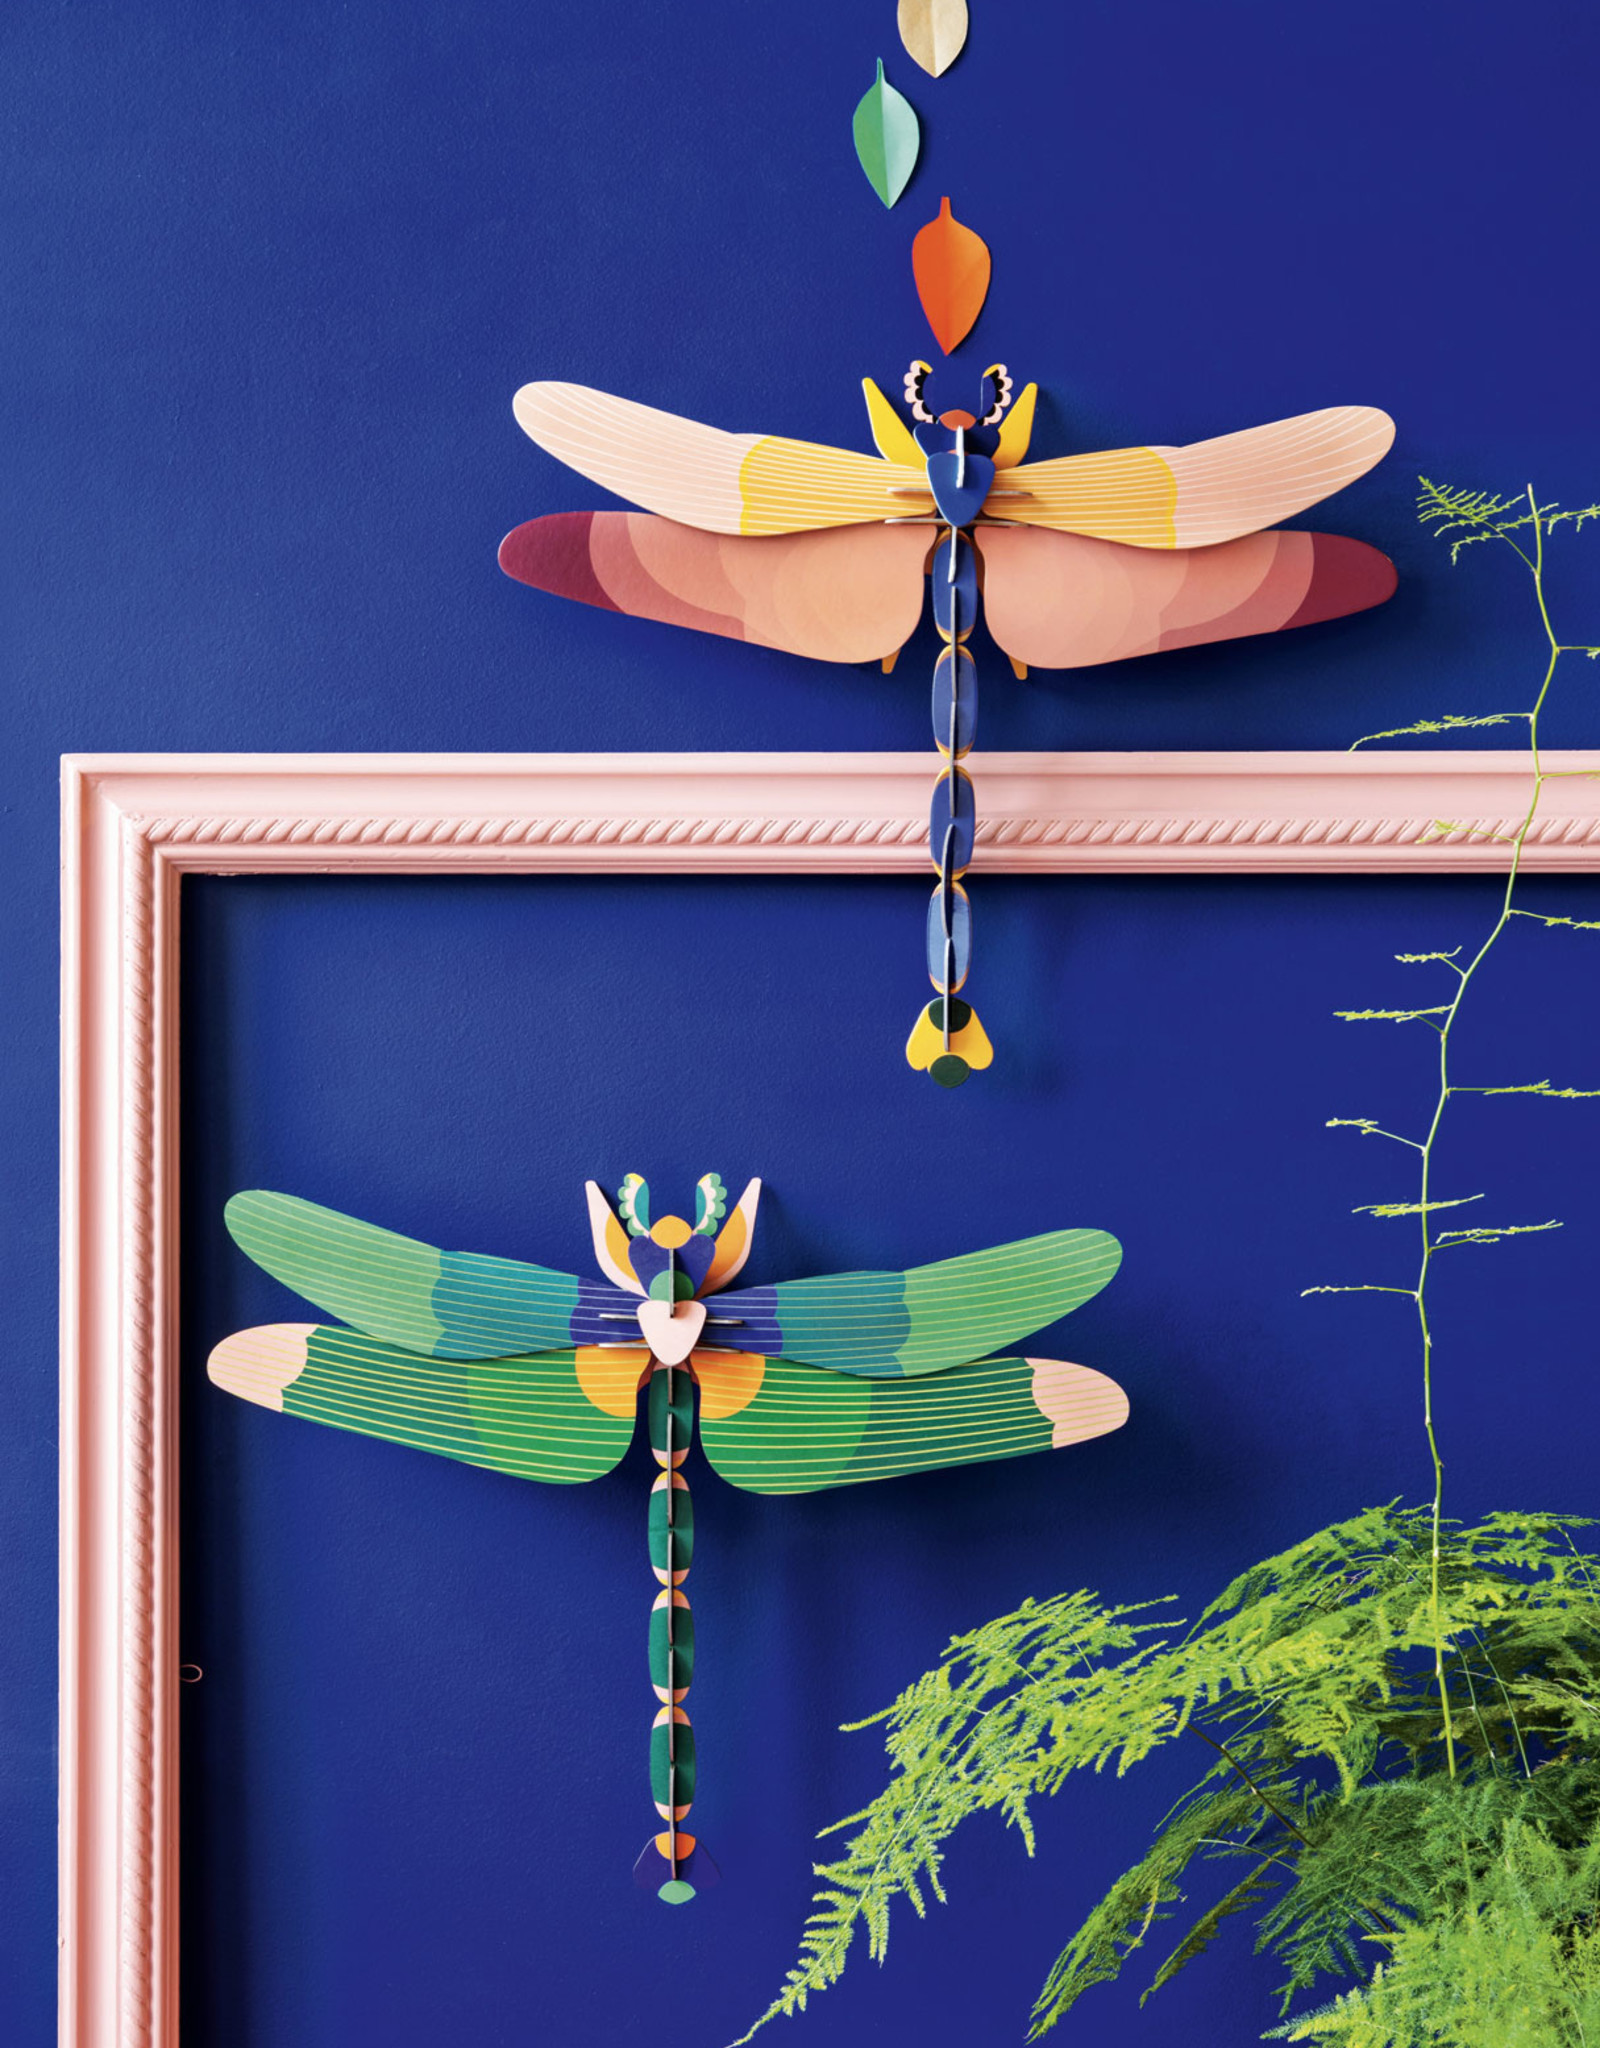 Studioroof Wall Decor Green Dragonfly